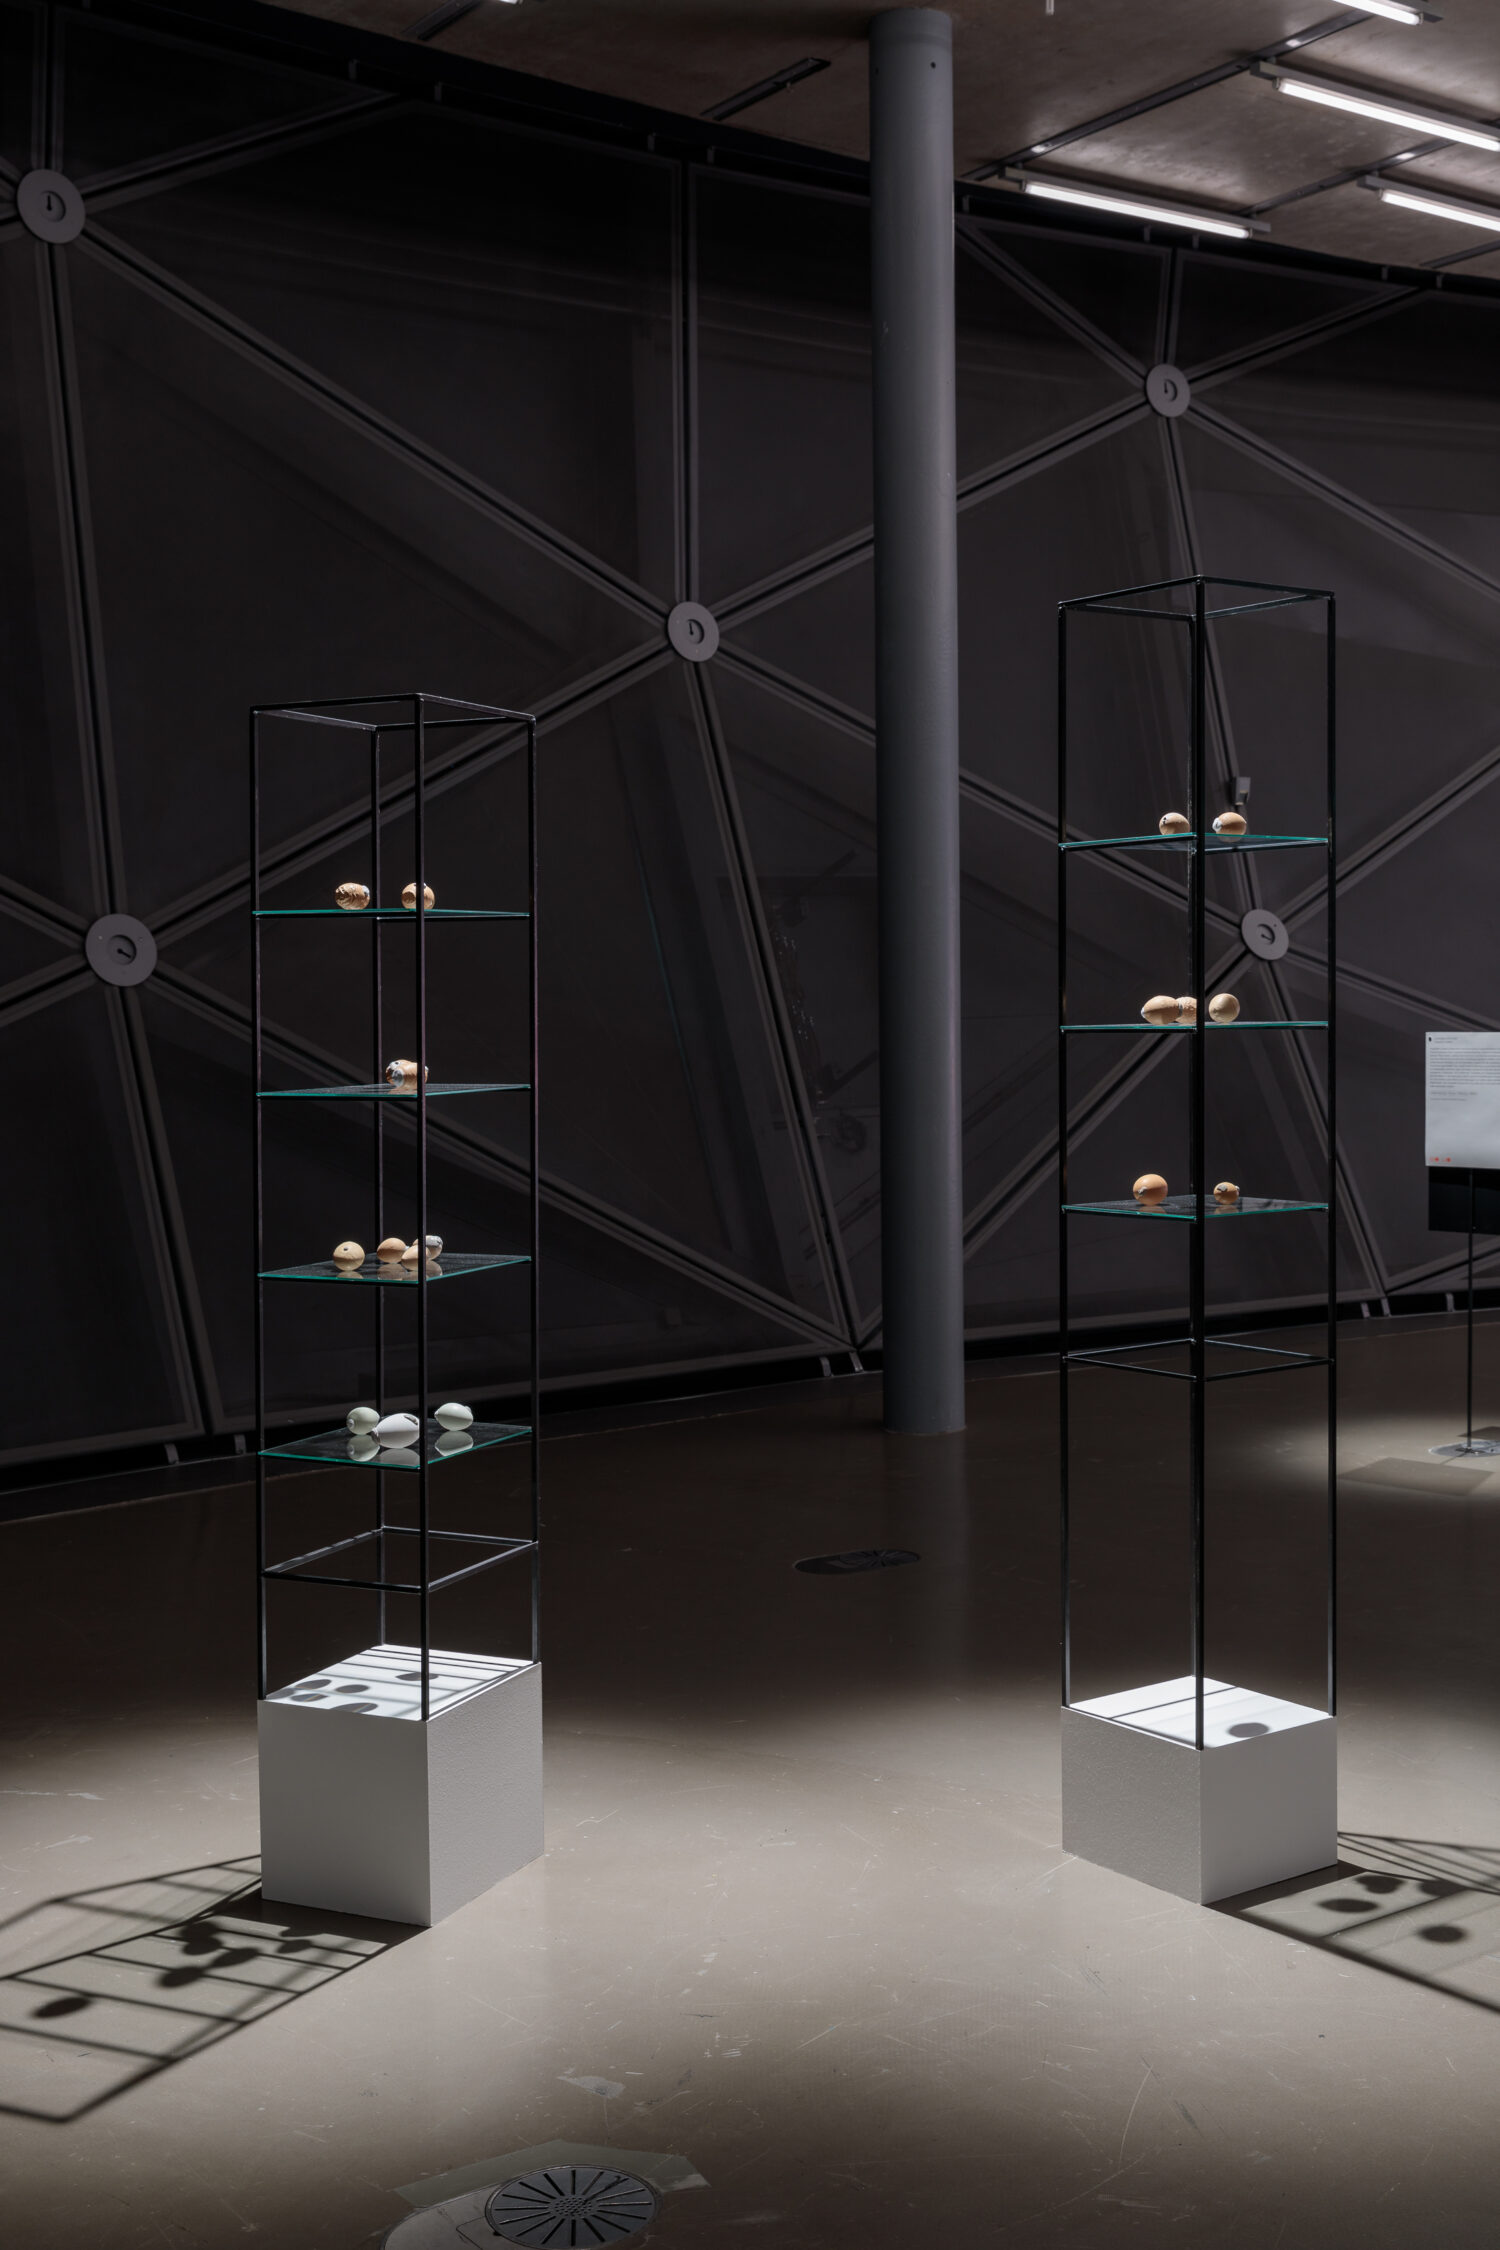 Angelika Loderer, Custodian I & II, 2021 © Bildrecht, Wien, 2021, Ausstellungsansicht, Foto: Kunsthaus Graz/N. Lackner